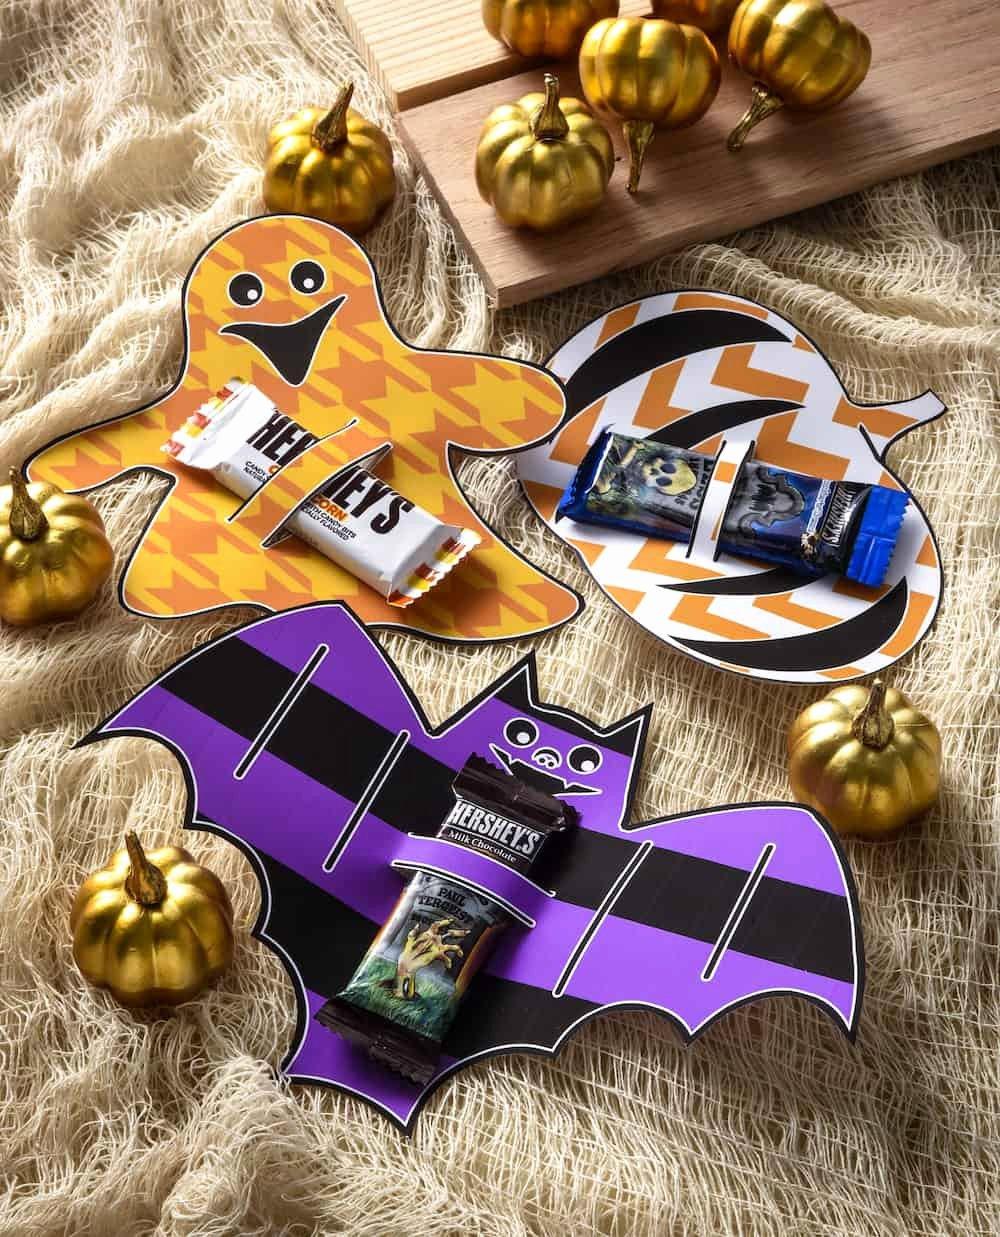 Halloween Candy Bar Wrappers Printables Inspirational Free Printable Halloween Candy Bar Wrappers Mod Podge Rocks